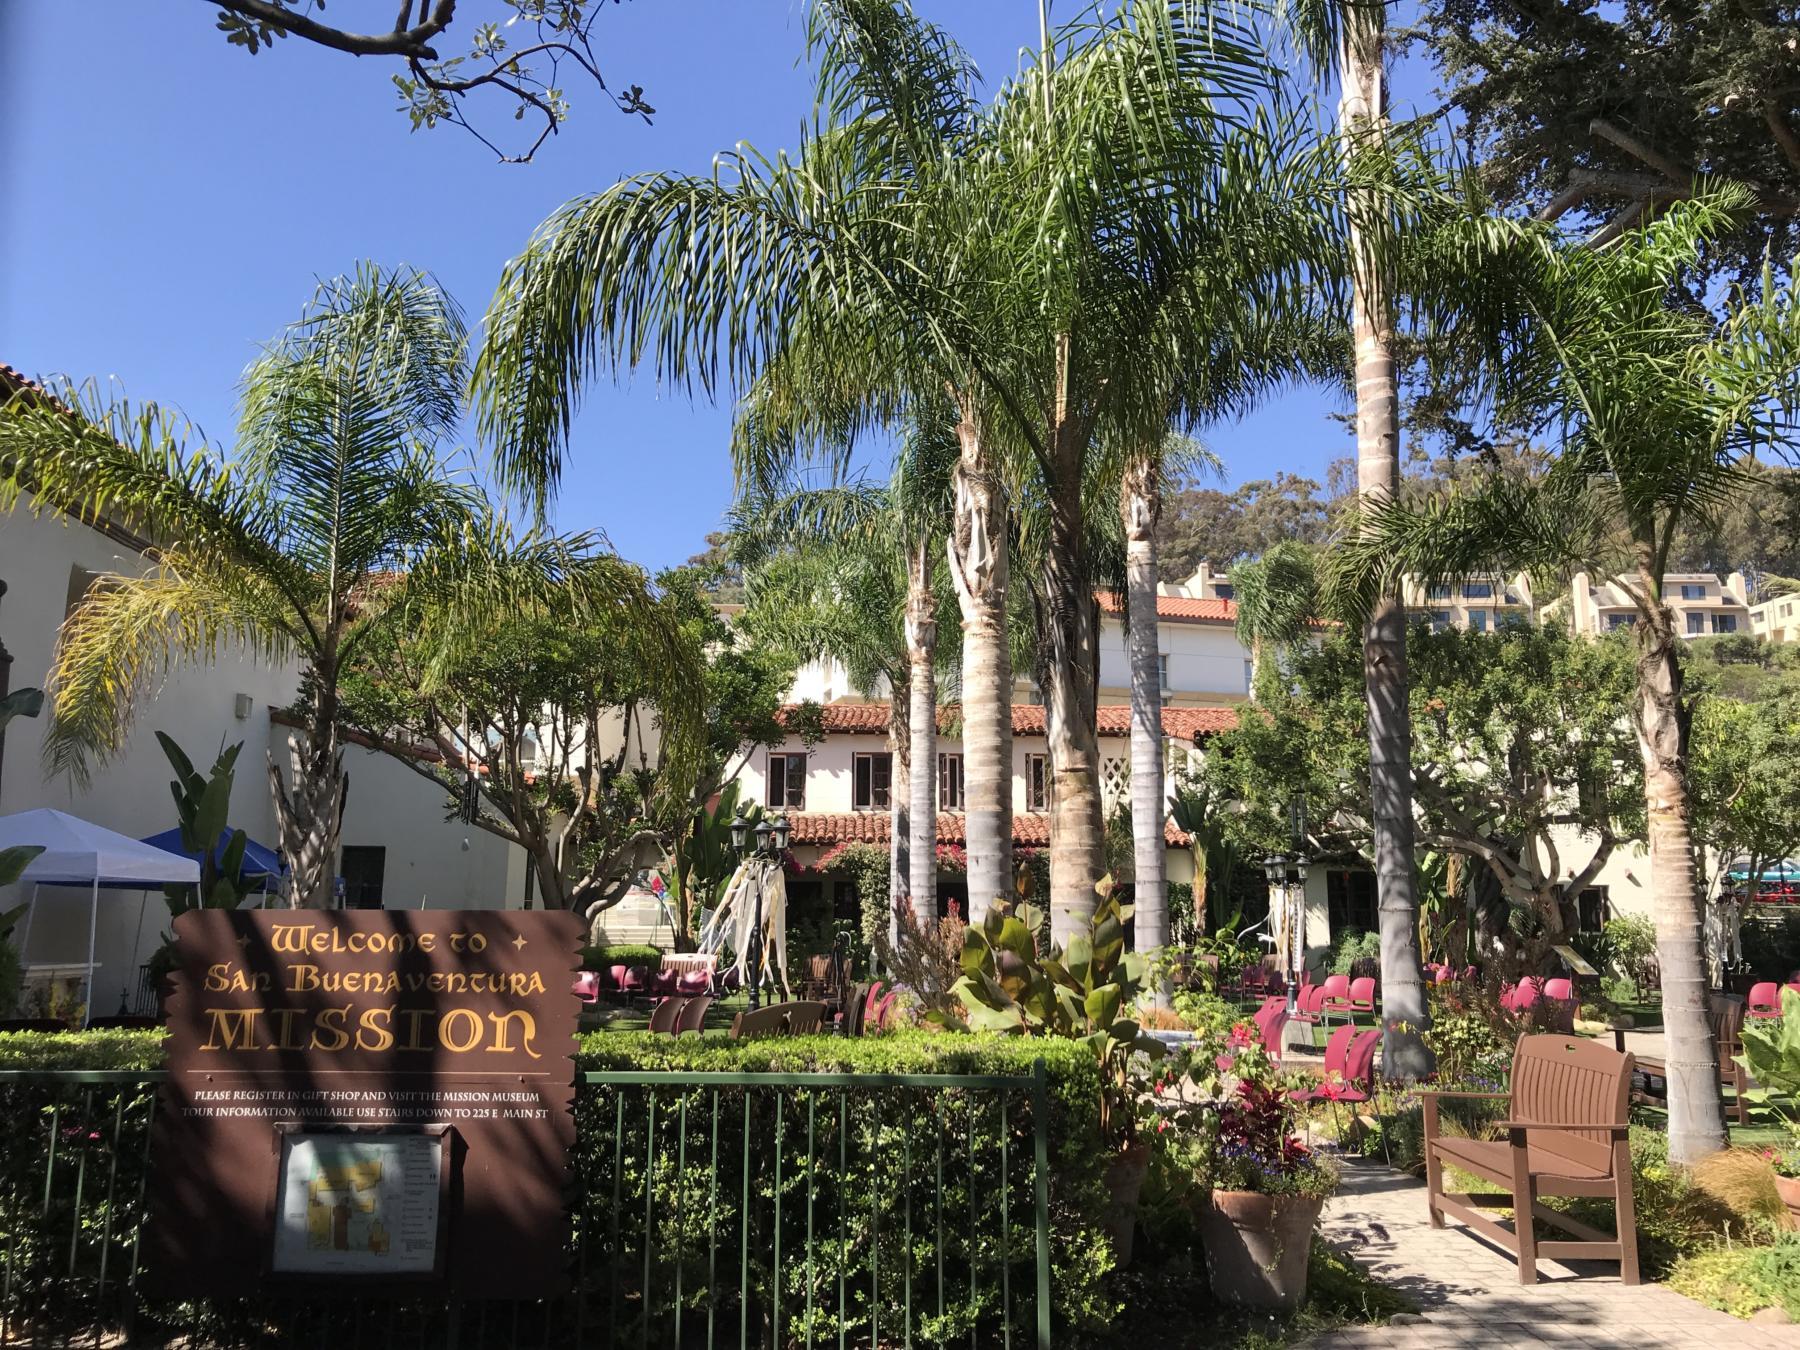 Downtown Ventura